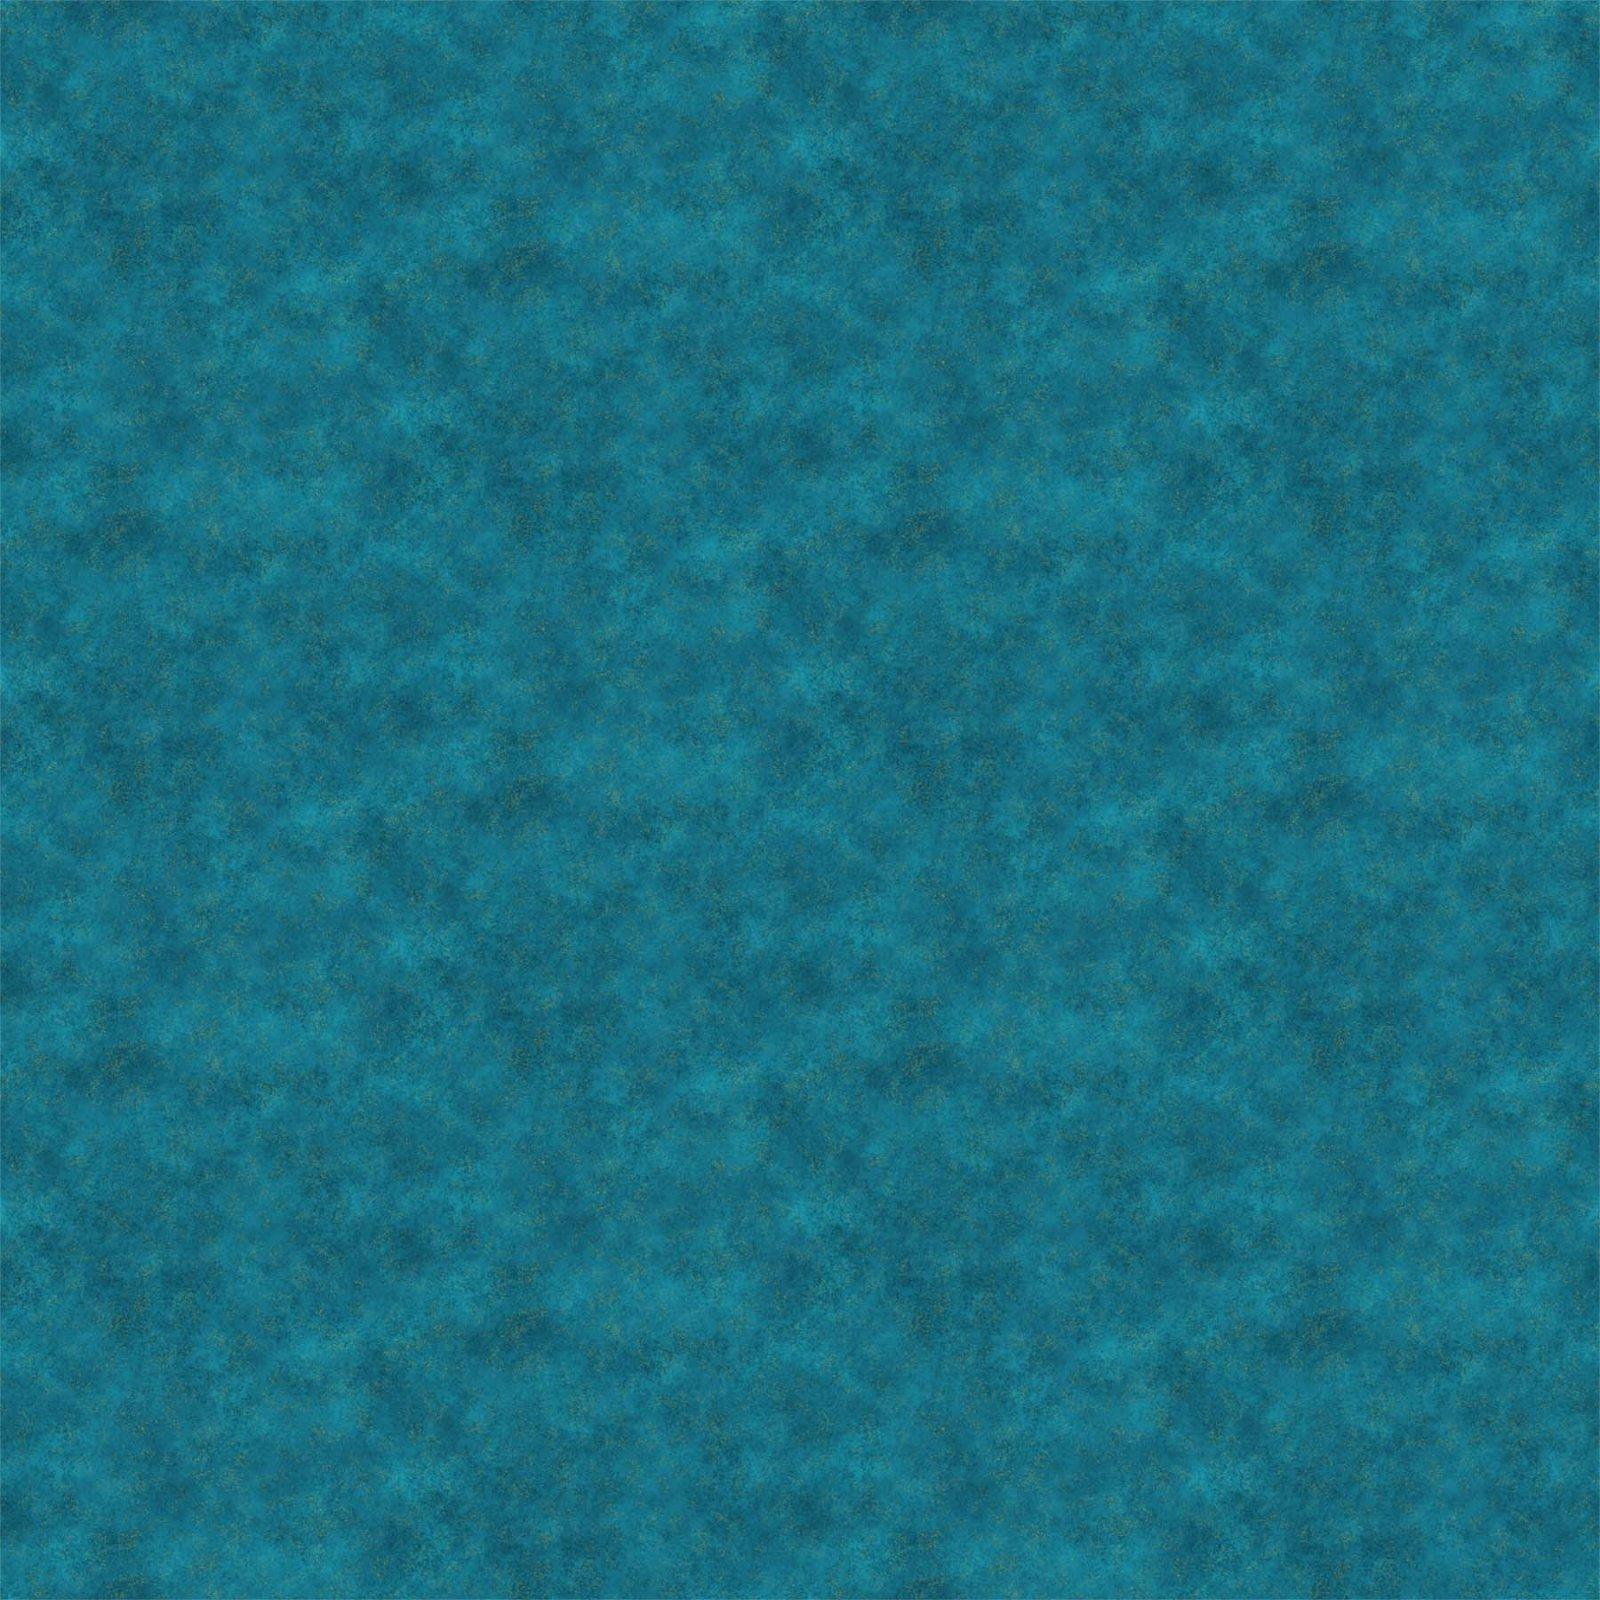 Shimmer - Radiance - Peacock